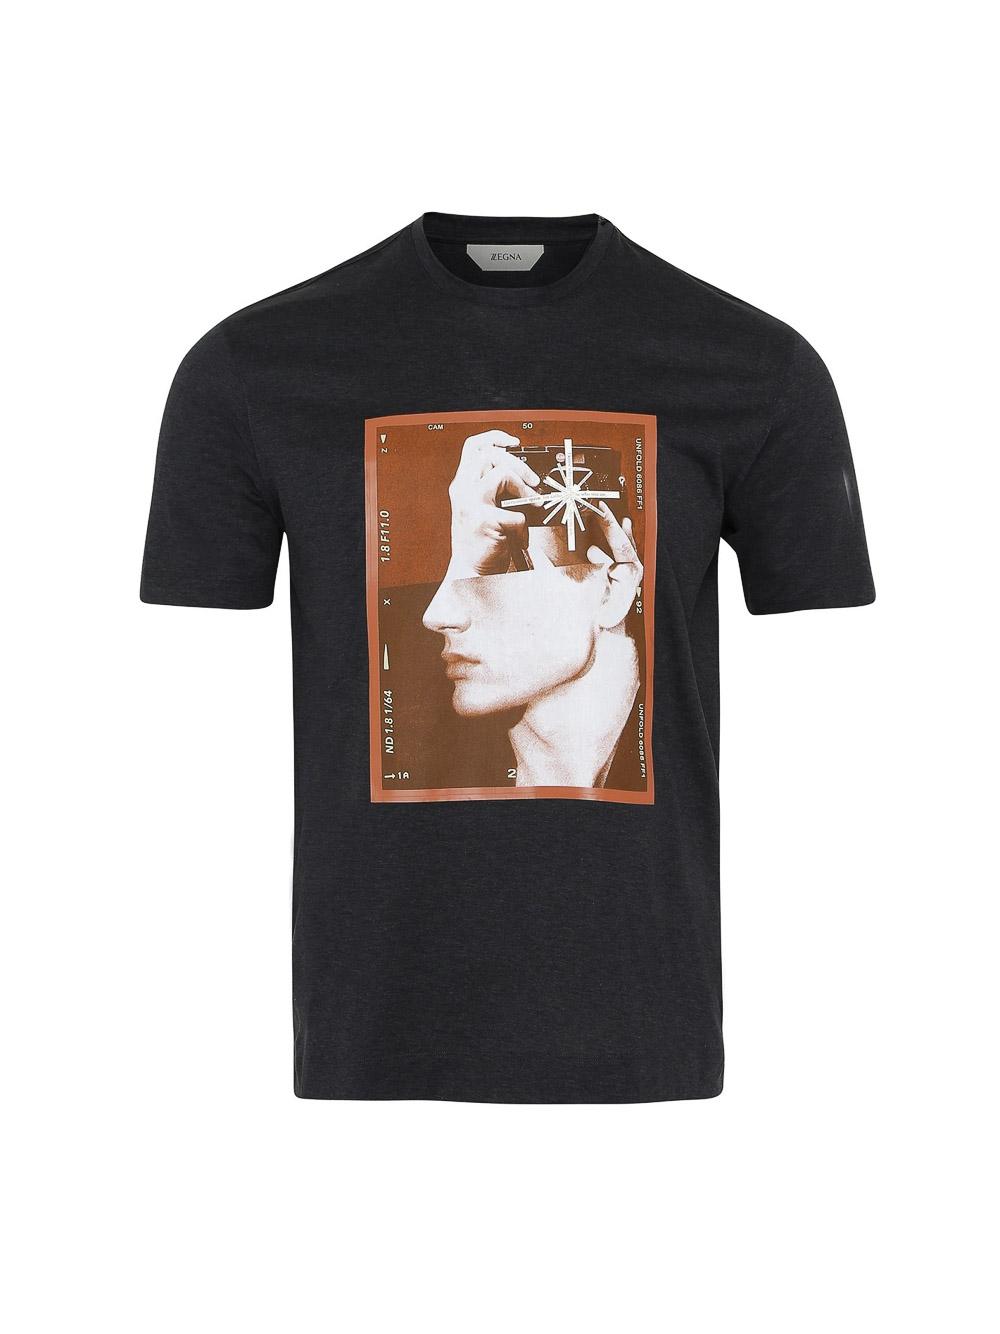 ZEGNA Μπλούζα T-Shirt VV375 ZZ6502-620 ΓΚΡΙ